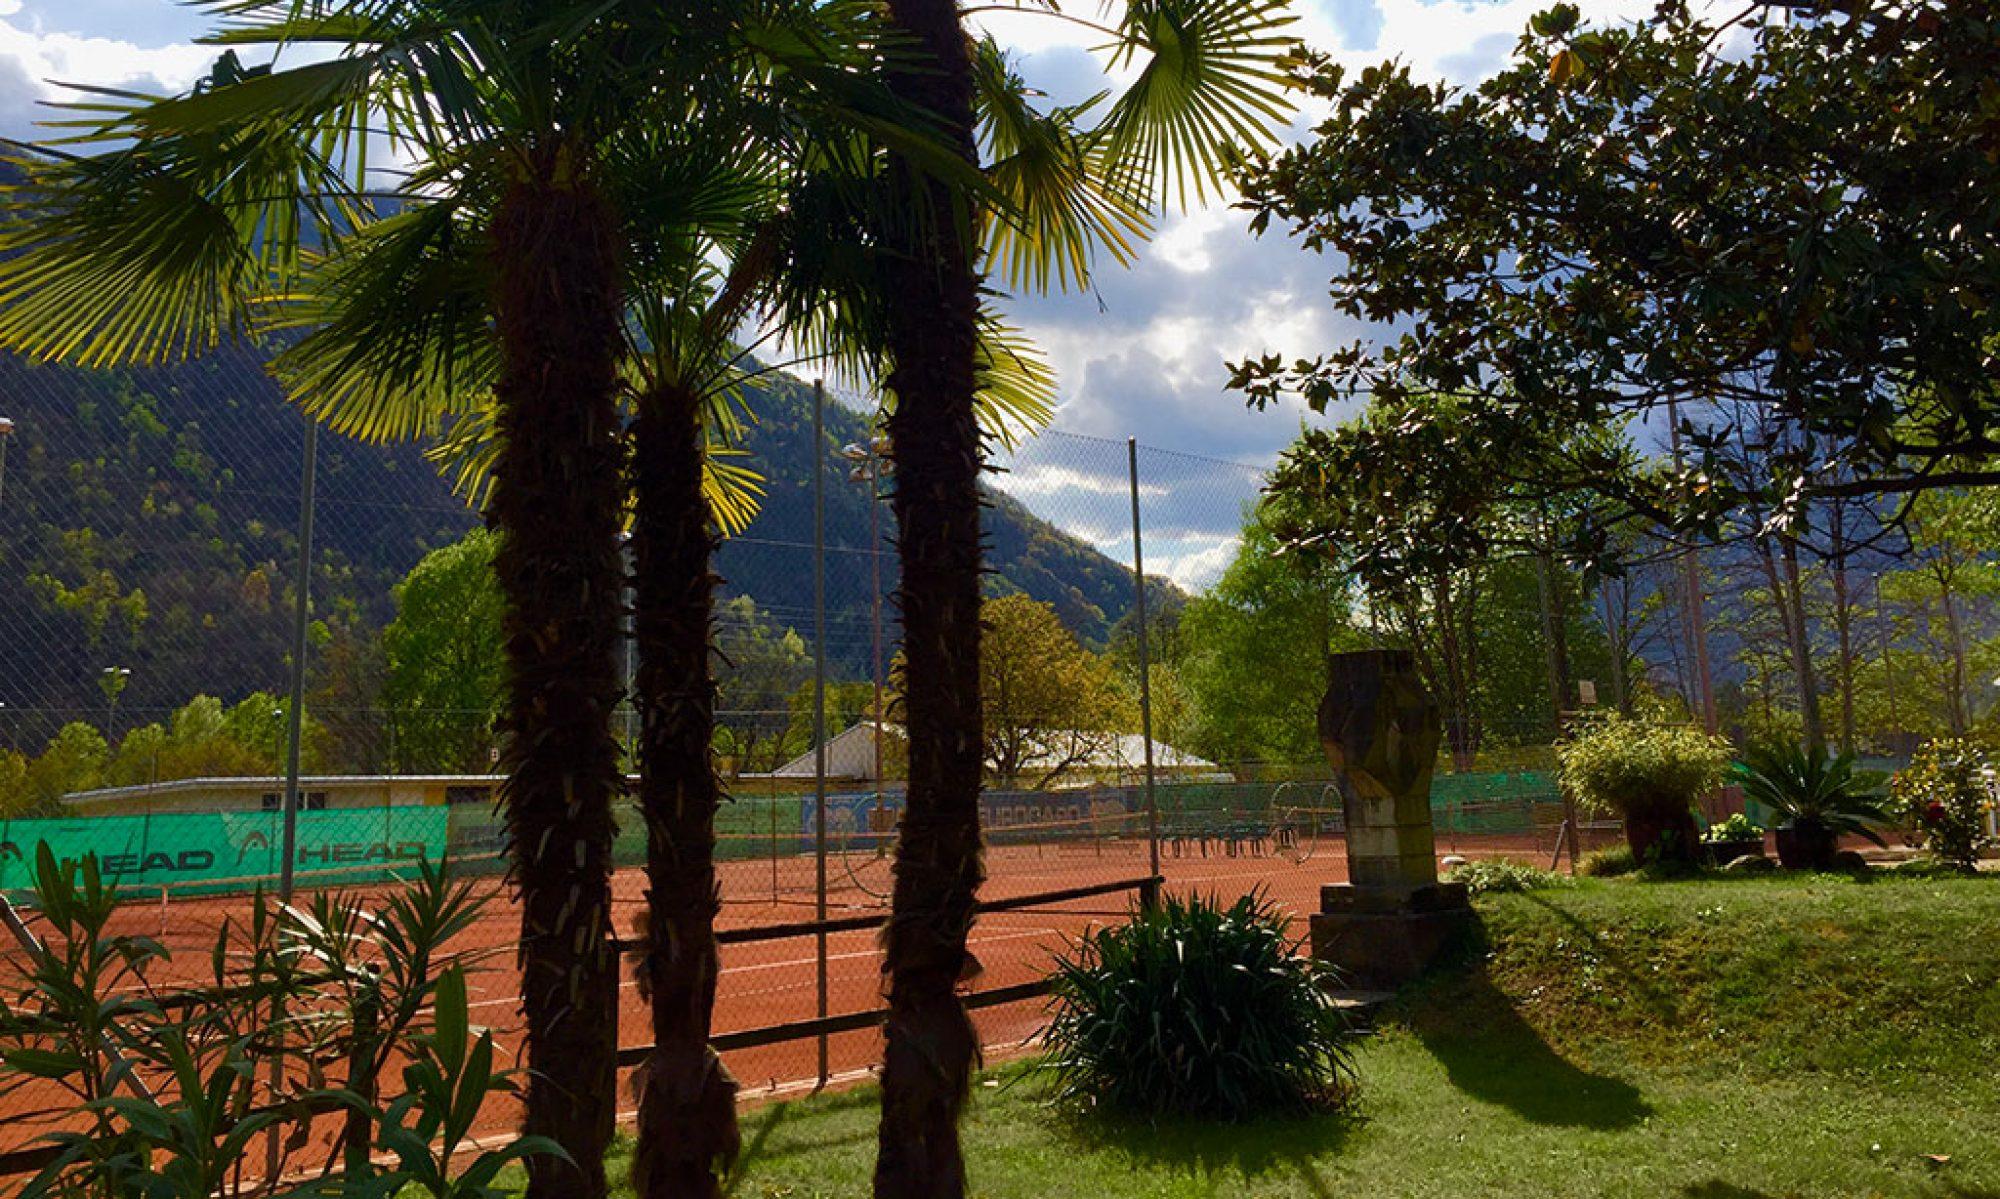 Tennis Club Pedemonte Verscio